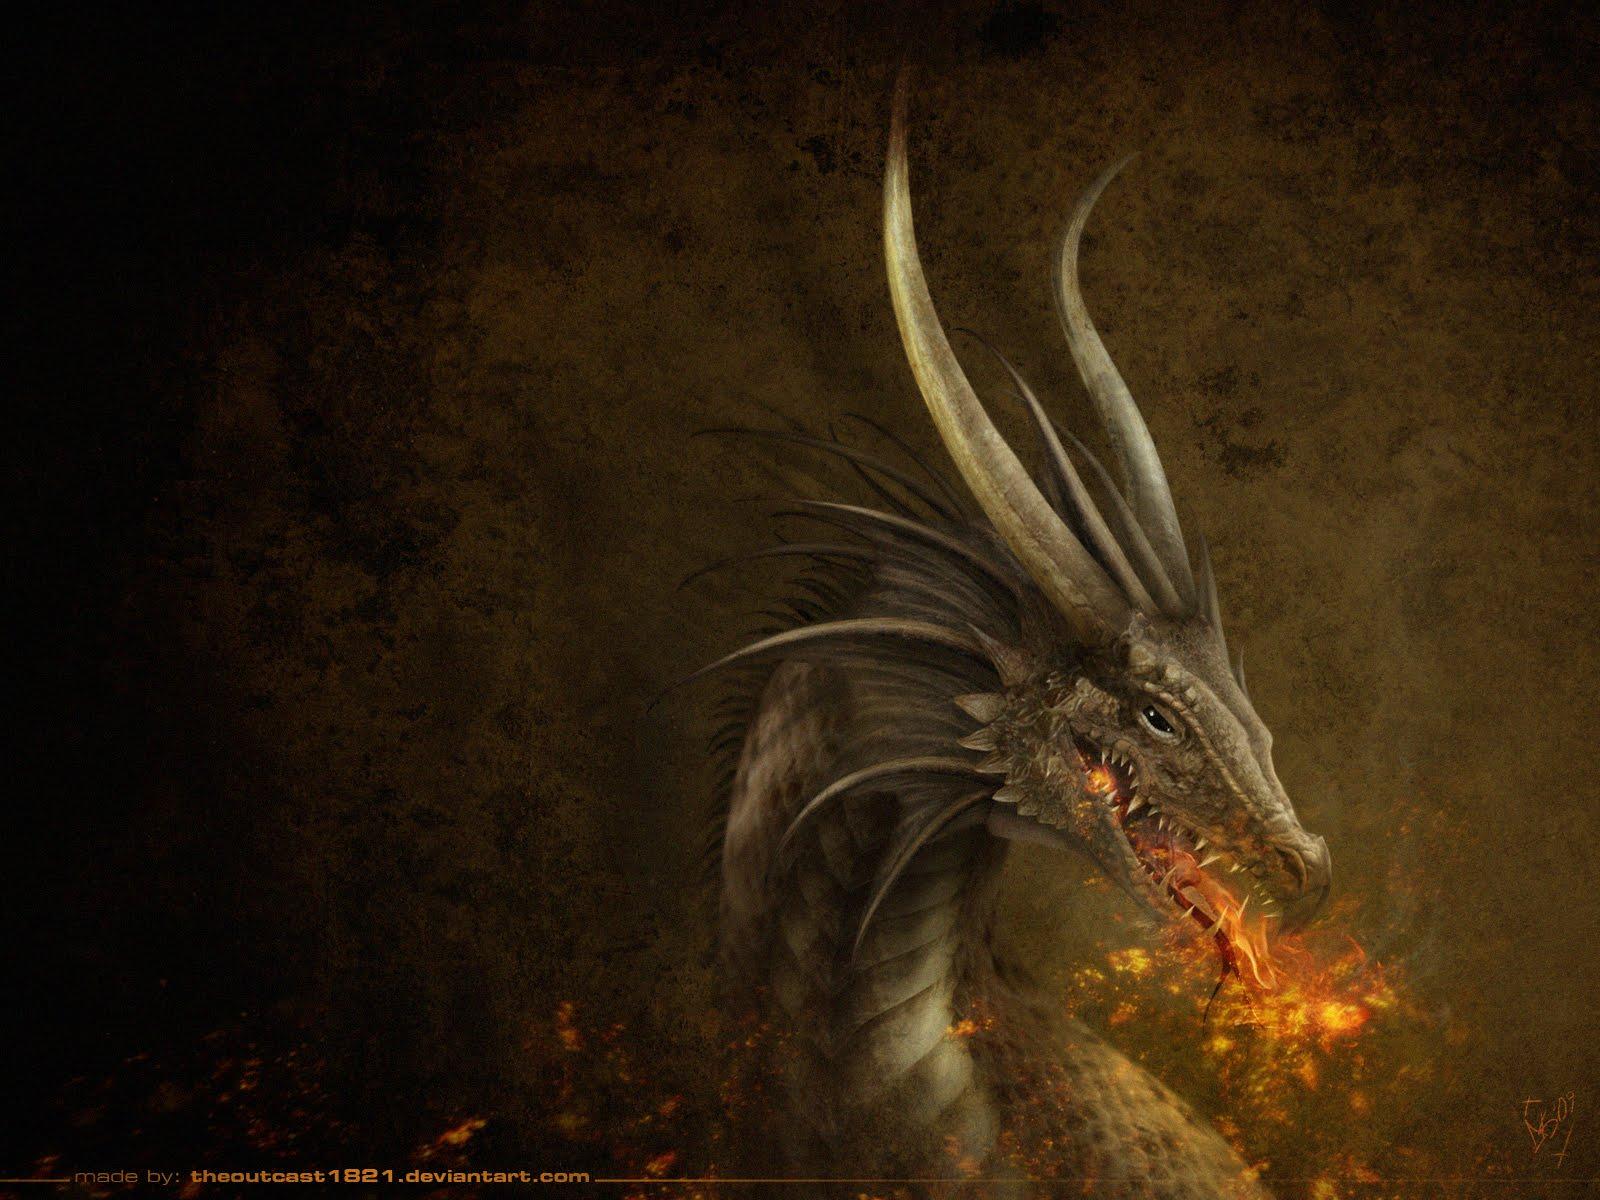 http://2.bp.blogspot.com/_69ovQpZVdFw/TUwnitpZqwI/AAAAAAAAB9g/5MQvCt6fvBs/s1600/The_Dragon_wallpaper_by_TheOutcast1821.jpg